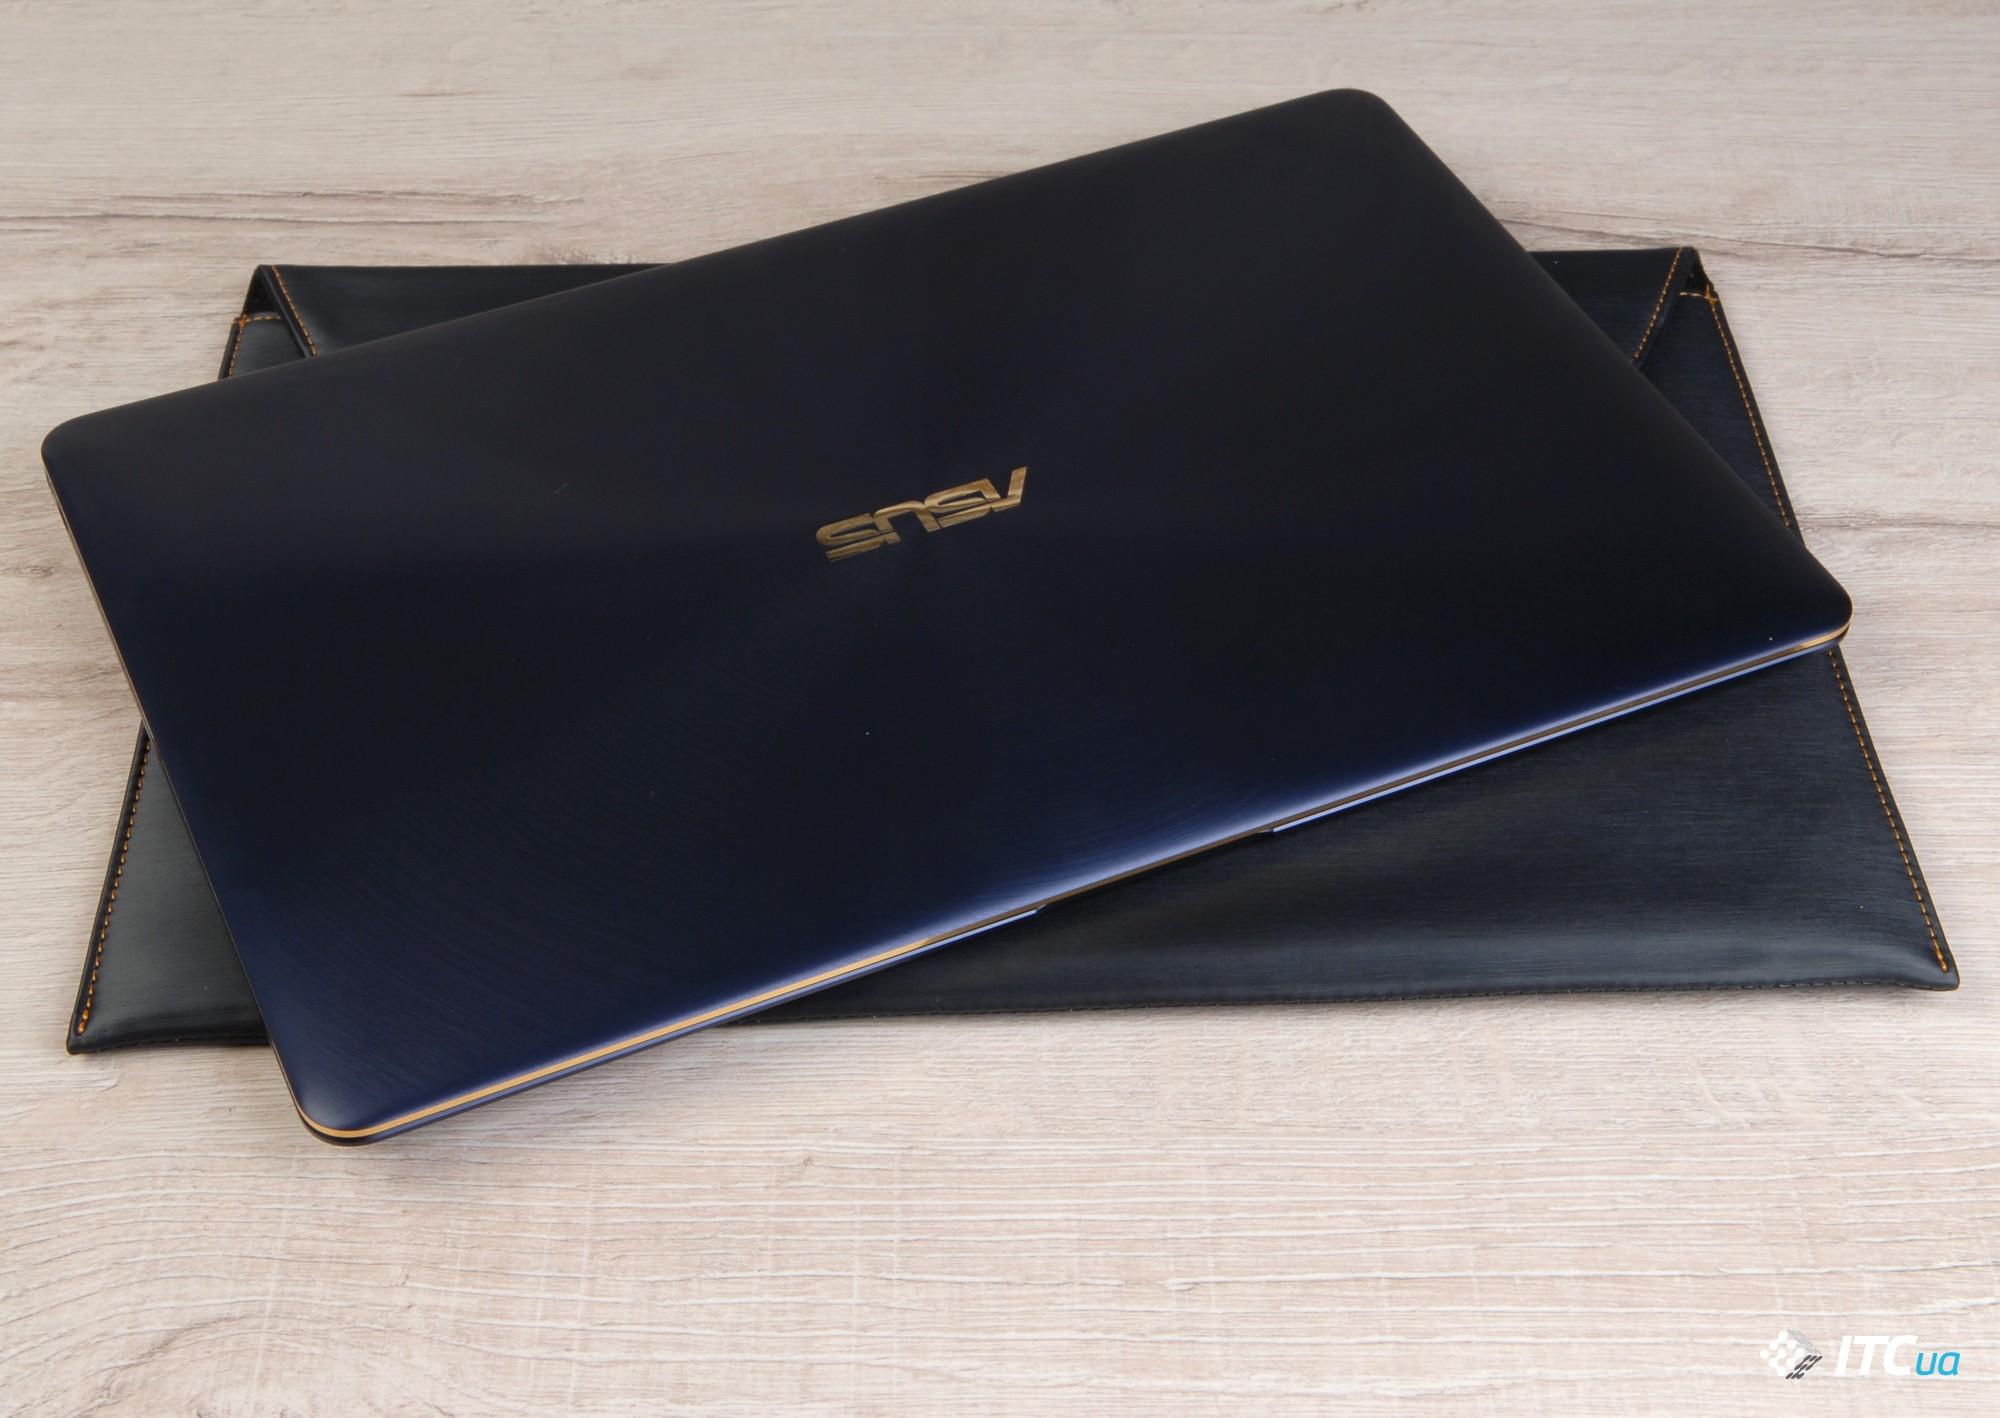 Обзор ASUS ZenBook 3 Deluxe (UX490UA) - ITC.ua